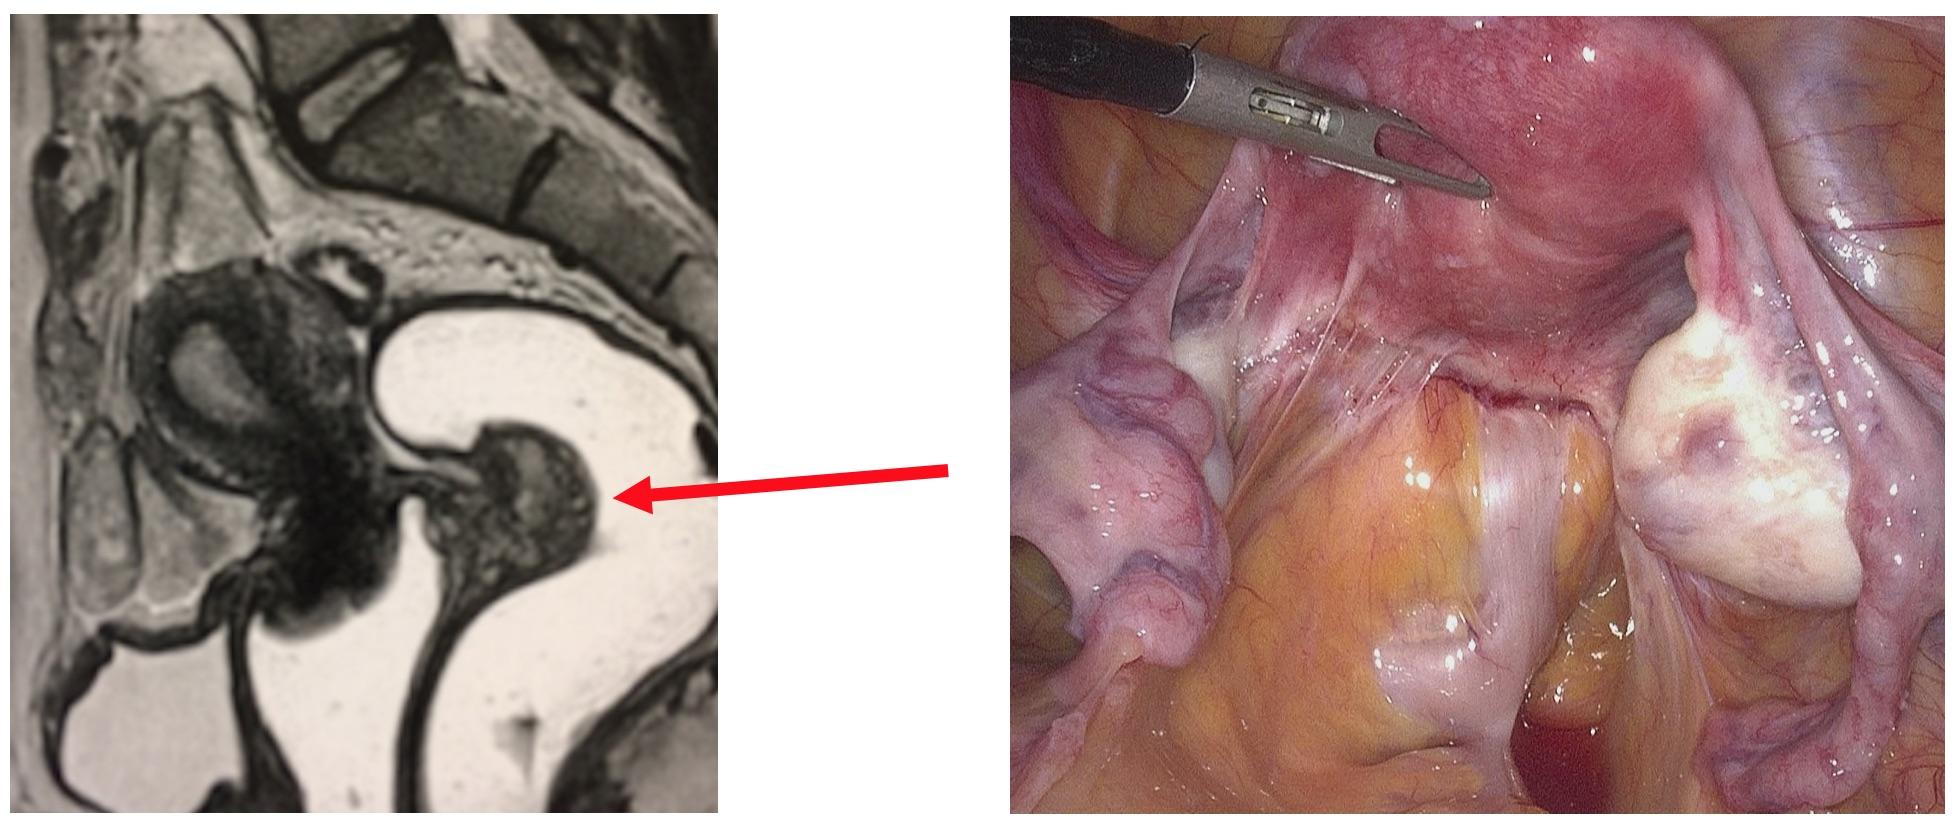 Chirurgie digestive nodule endométriose profonde